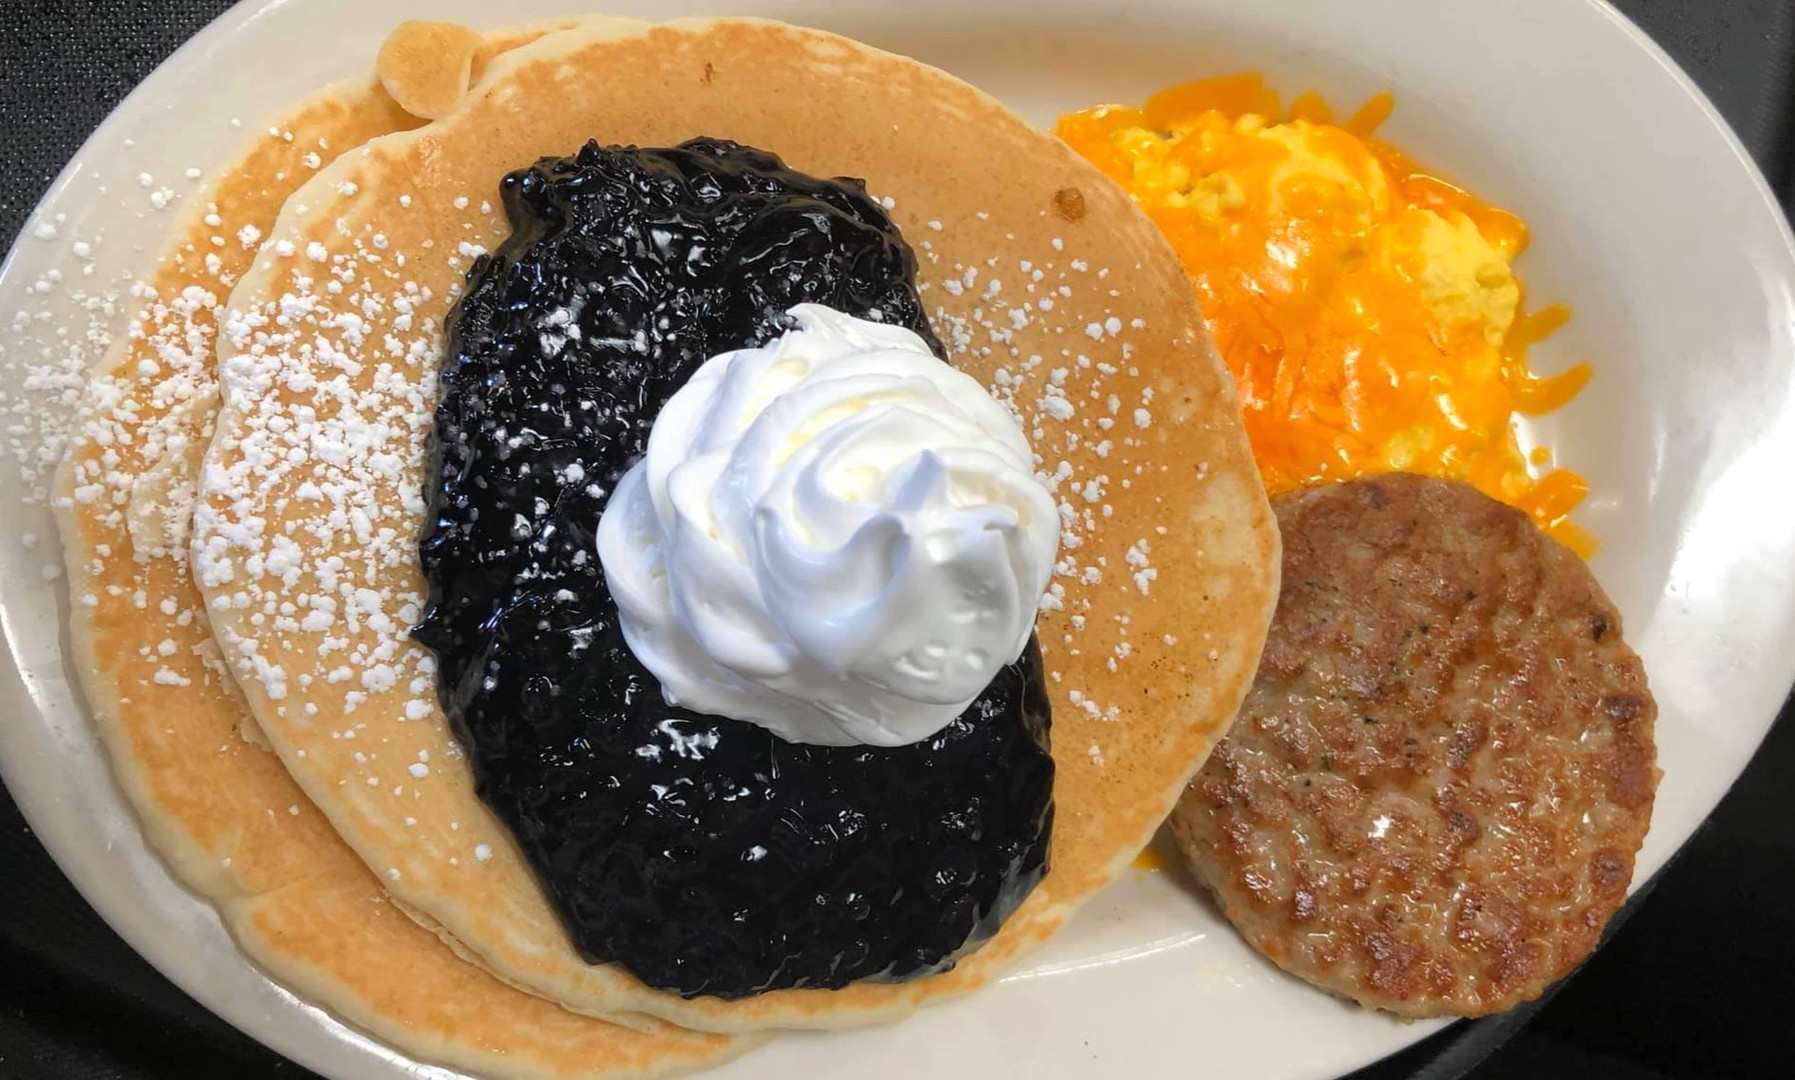 Blueberry%20pancakes%20with%20sausage_ed